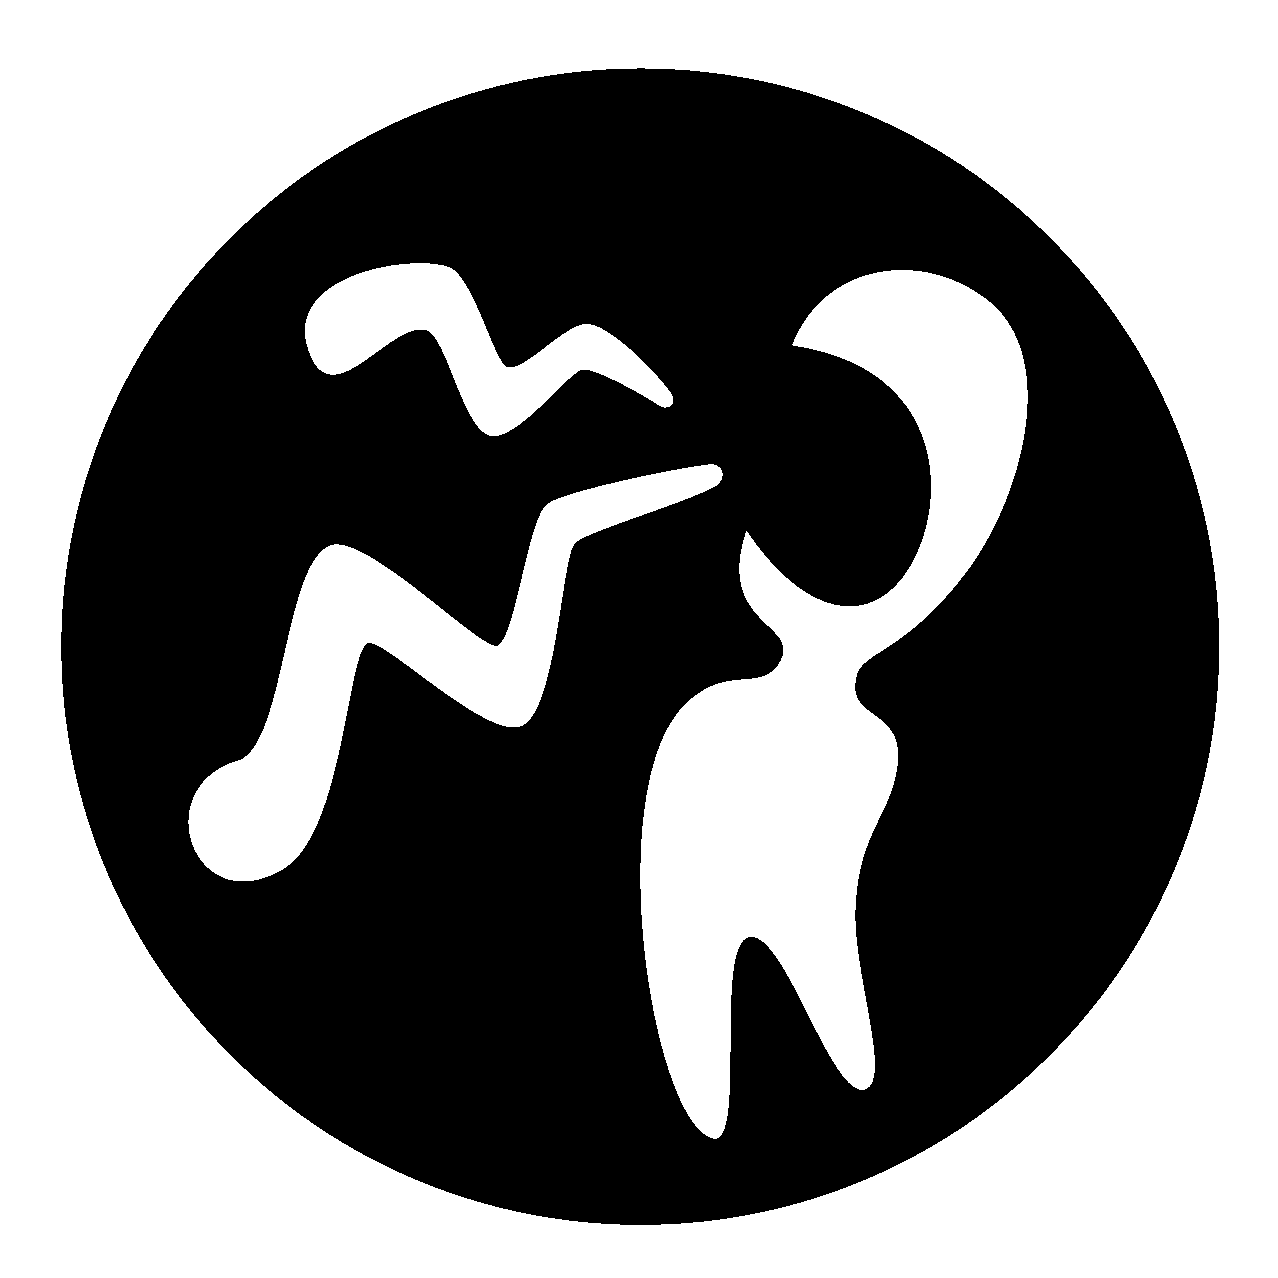 E.T Porte-clefs t/ête dAlien Zone 51 Roswell OOTB Porte-cl/és Extraterrestre